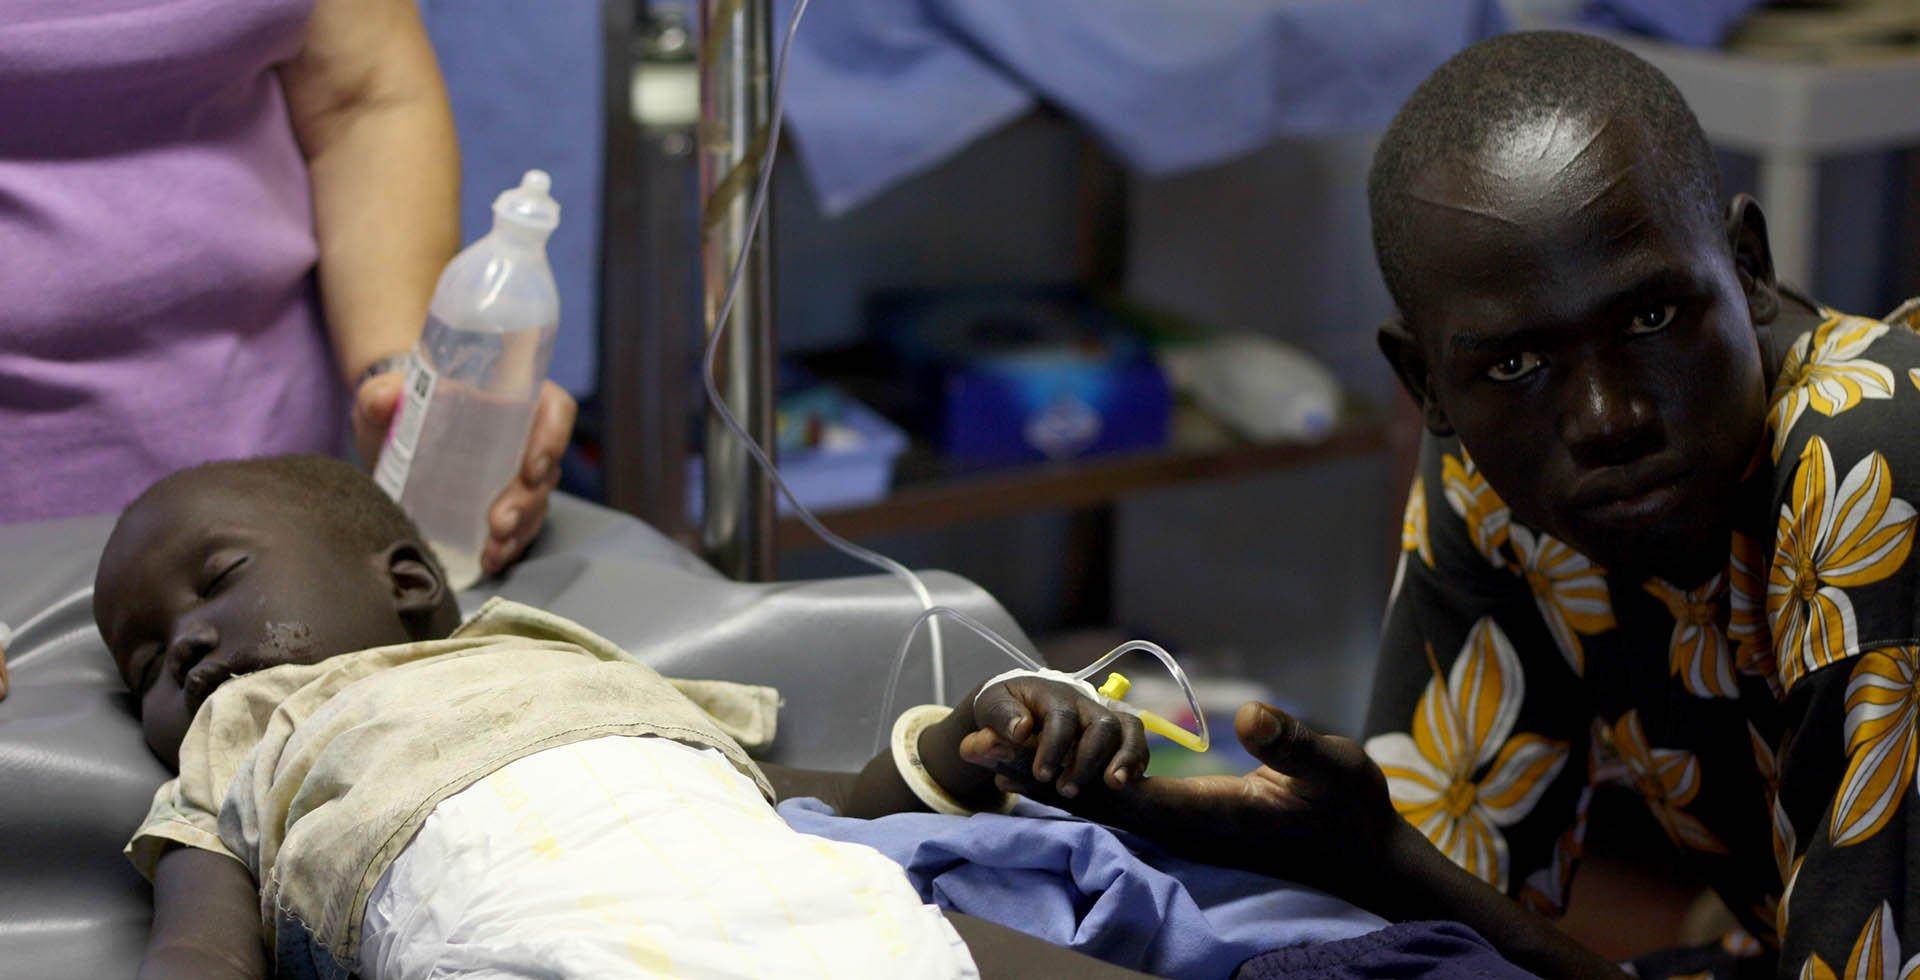 Donazioni Onlus assistenza sanitaria Africa Sud Sudan,Tonjproject